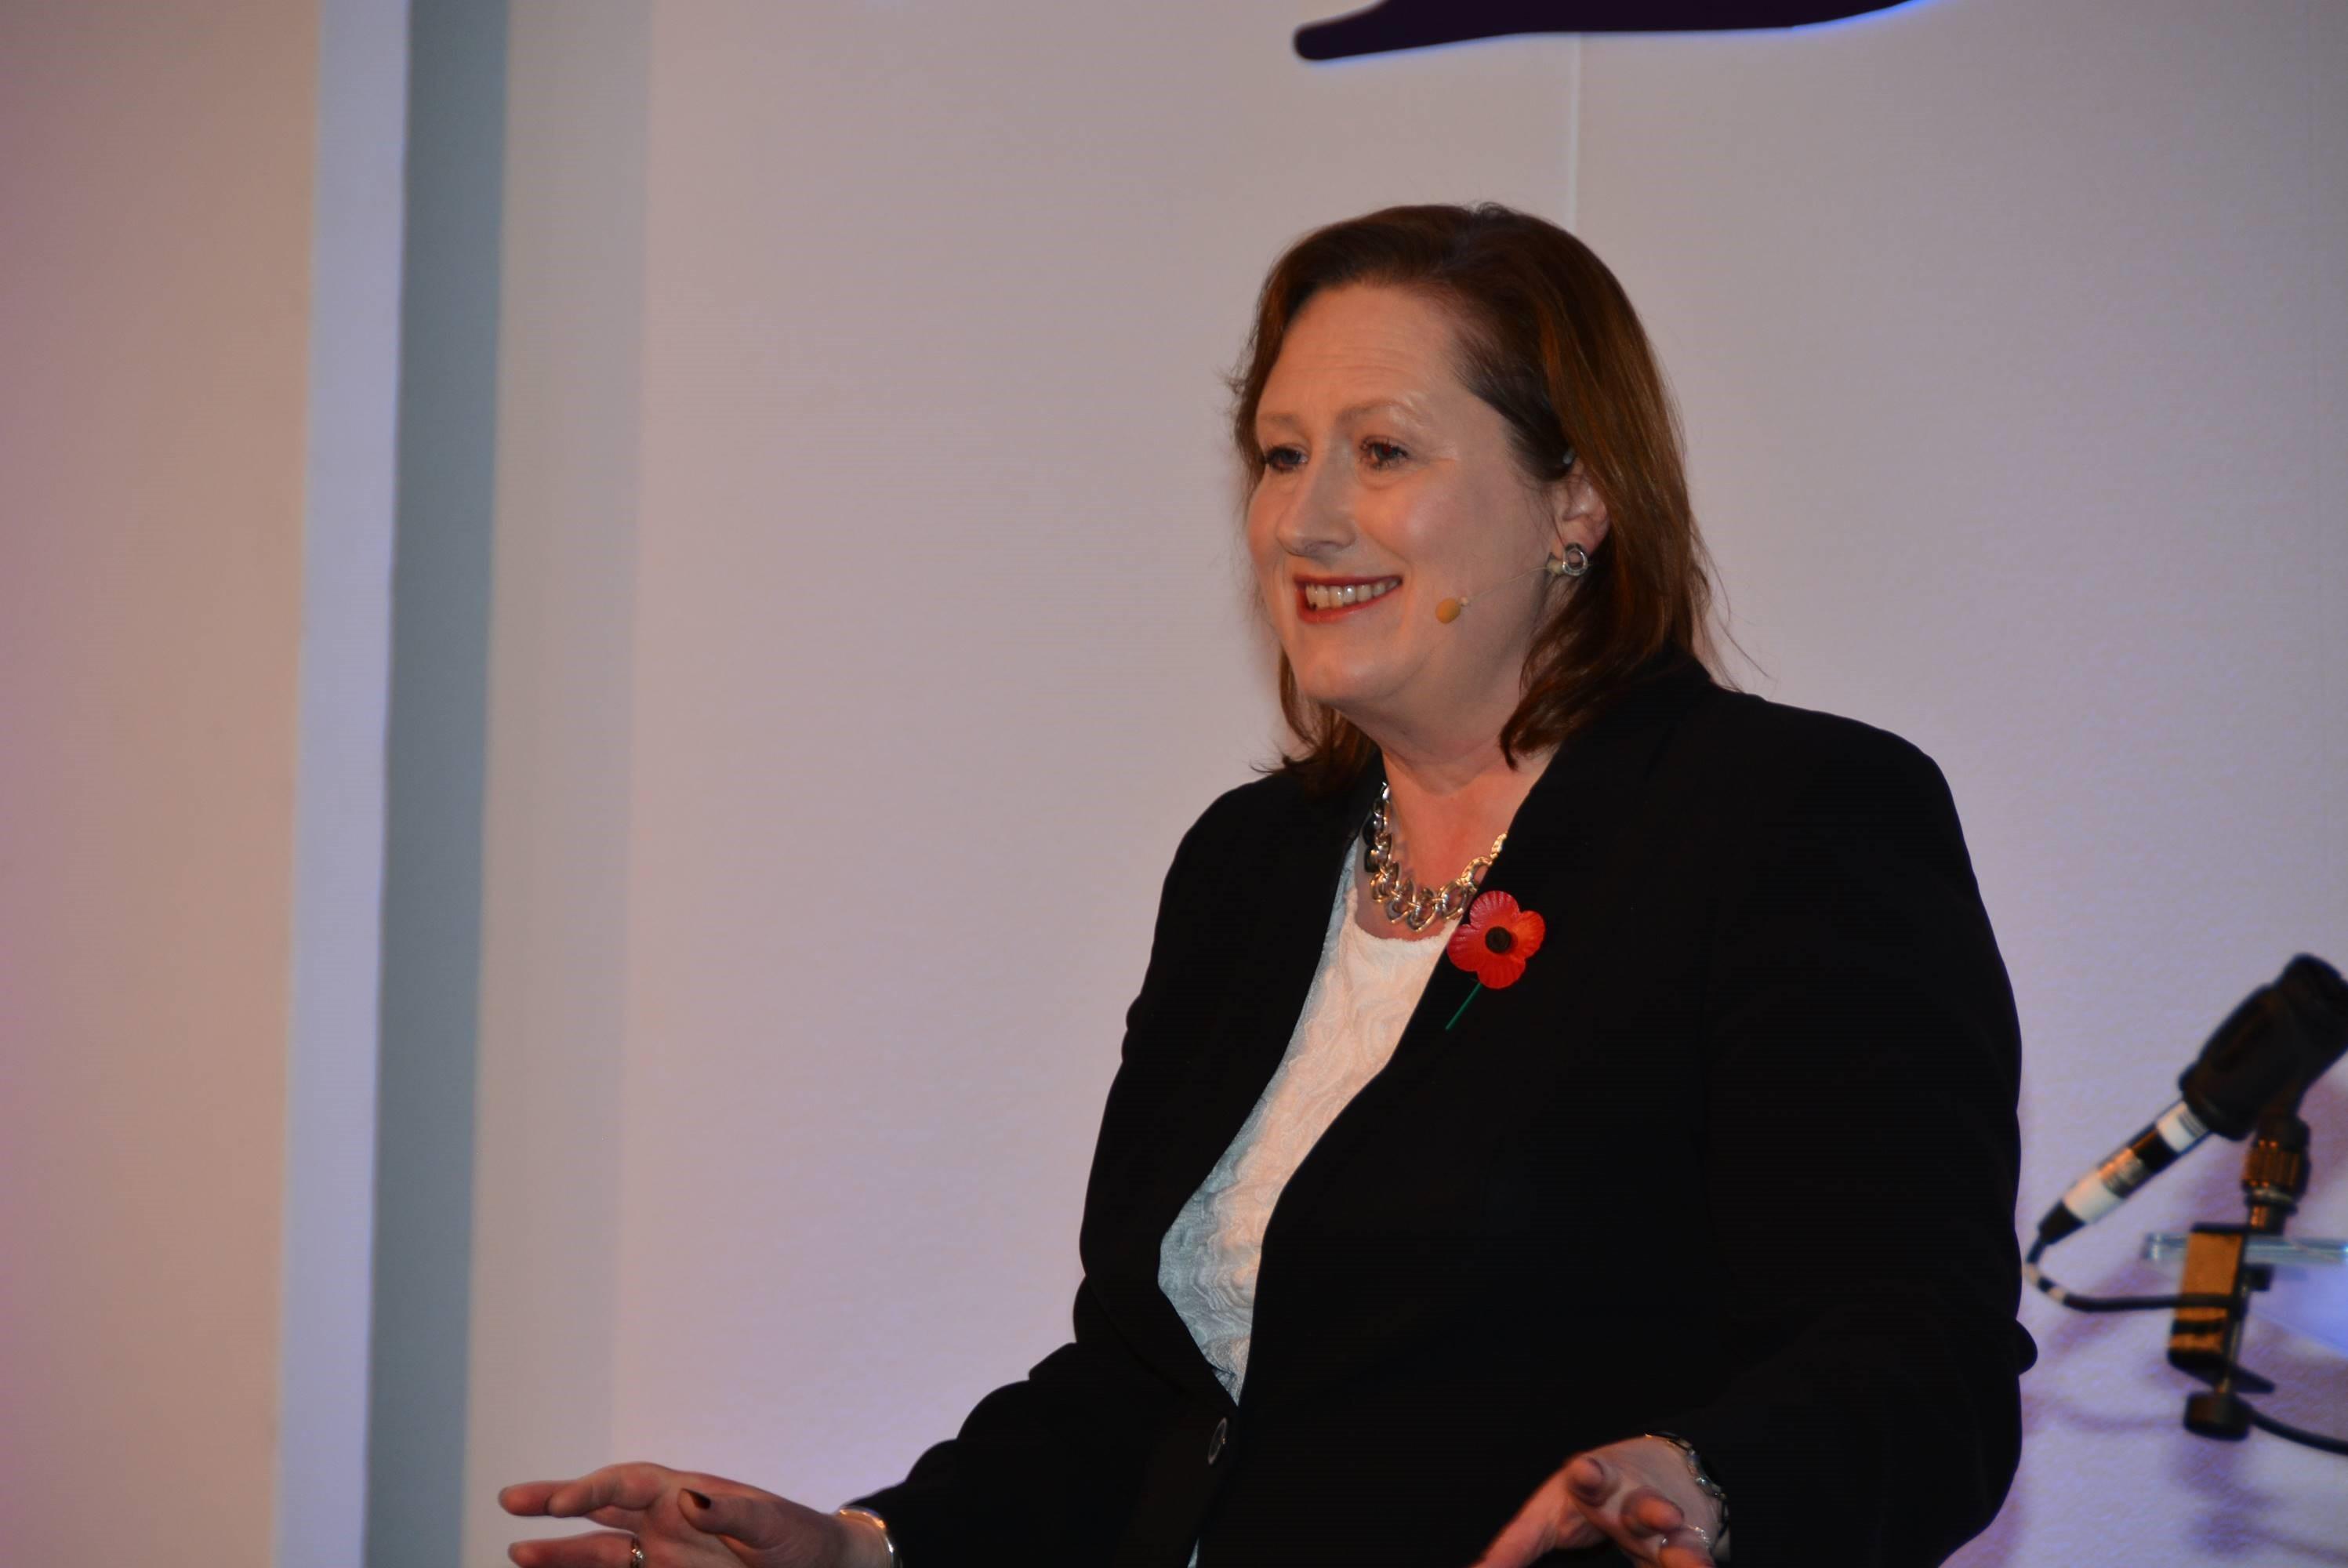 IoD Scotland chairman, Professor Susan Deacon